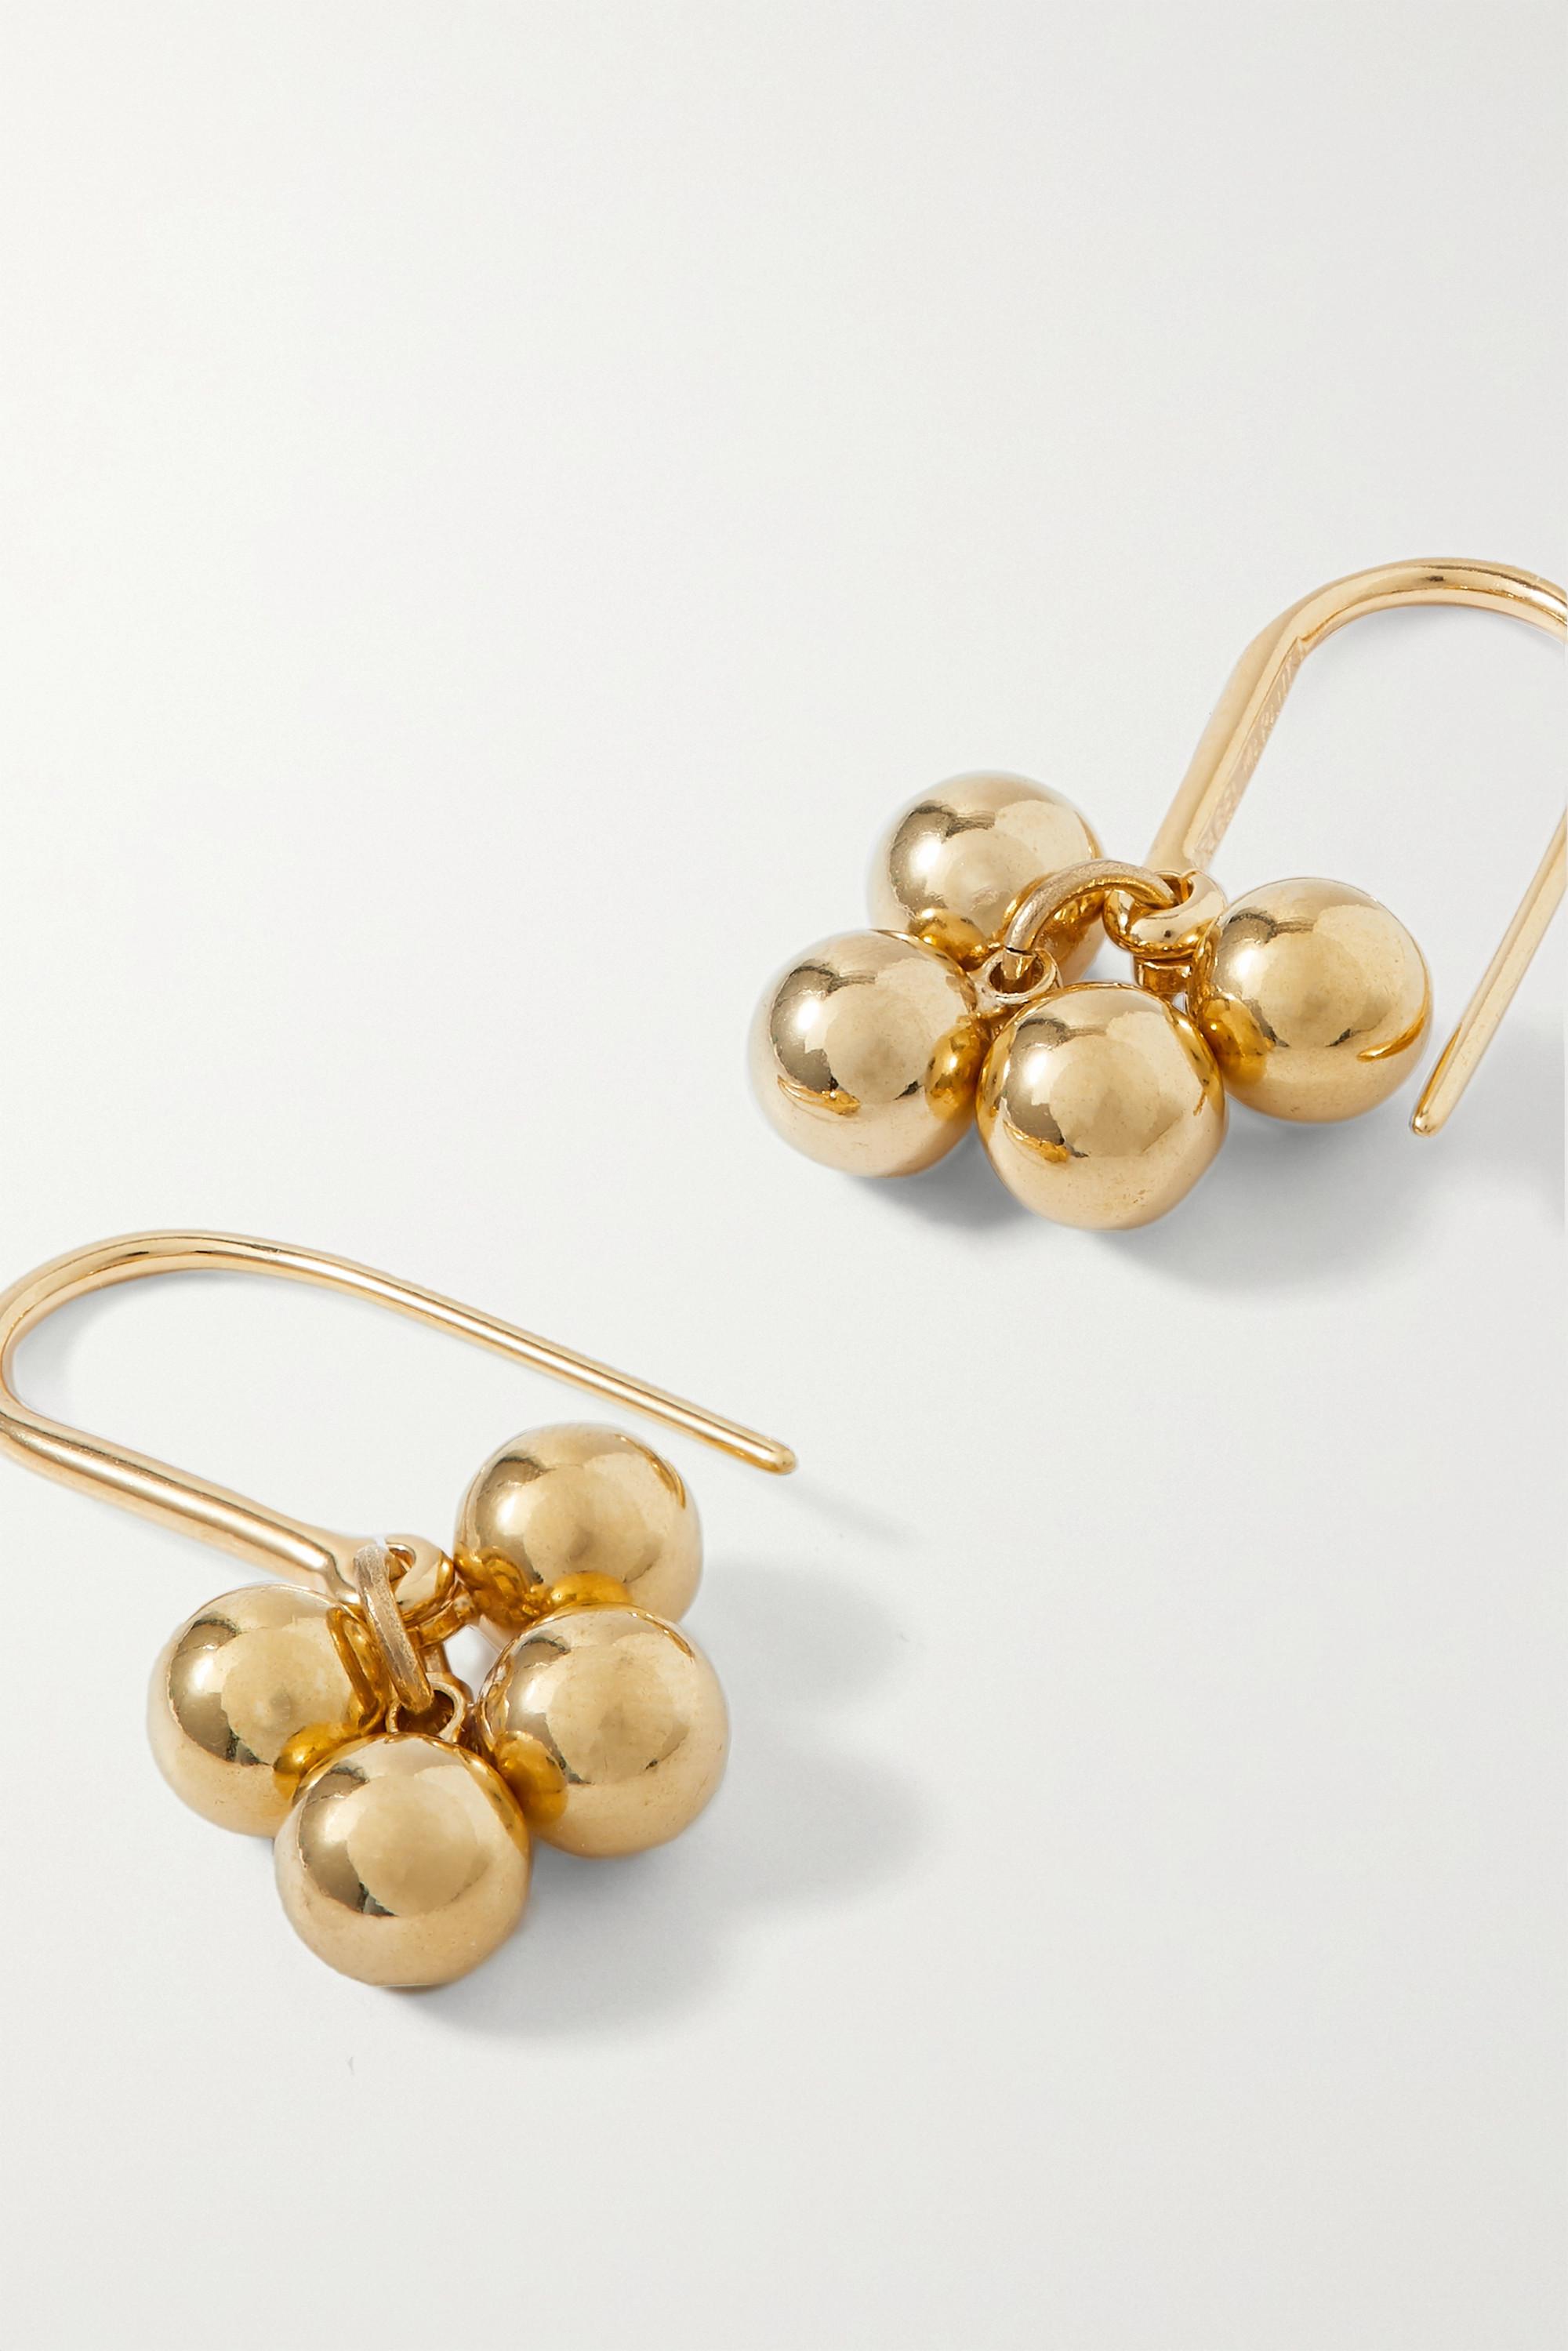 Isabel Marant Gold-tone earrings